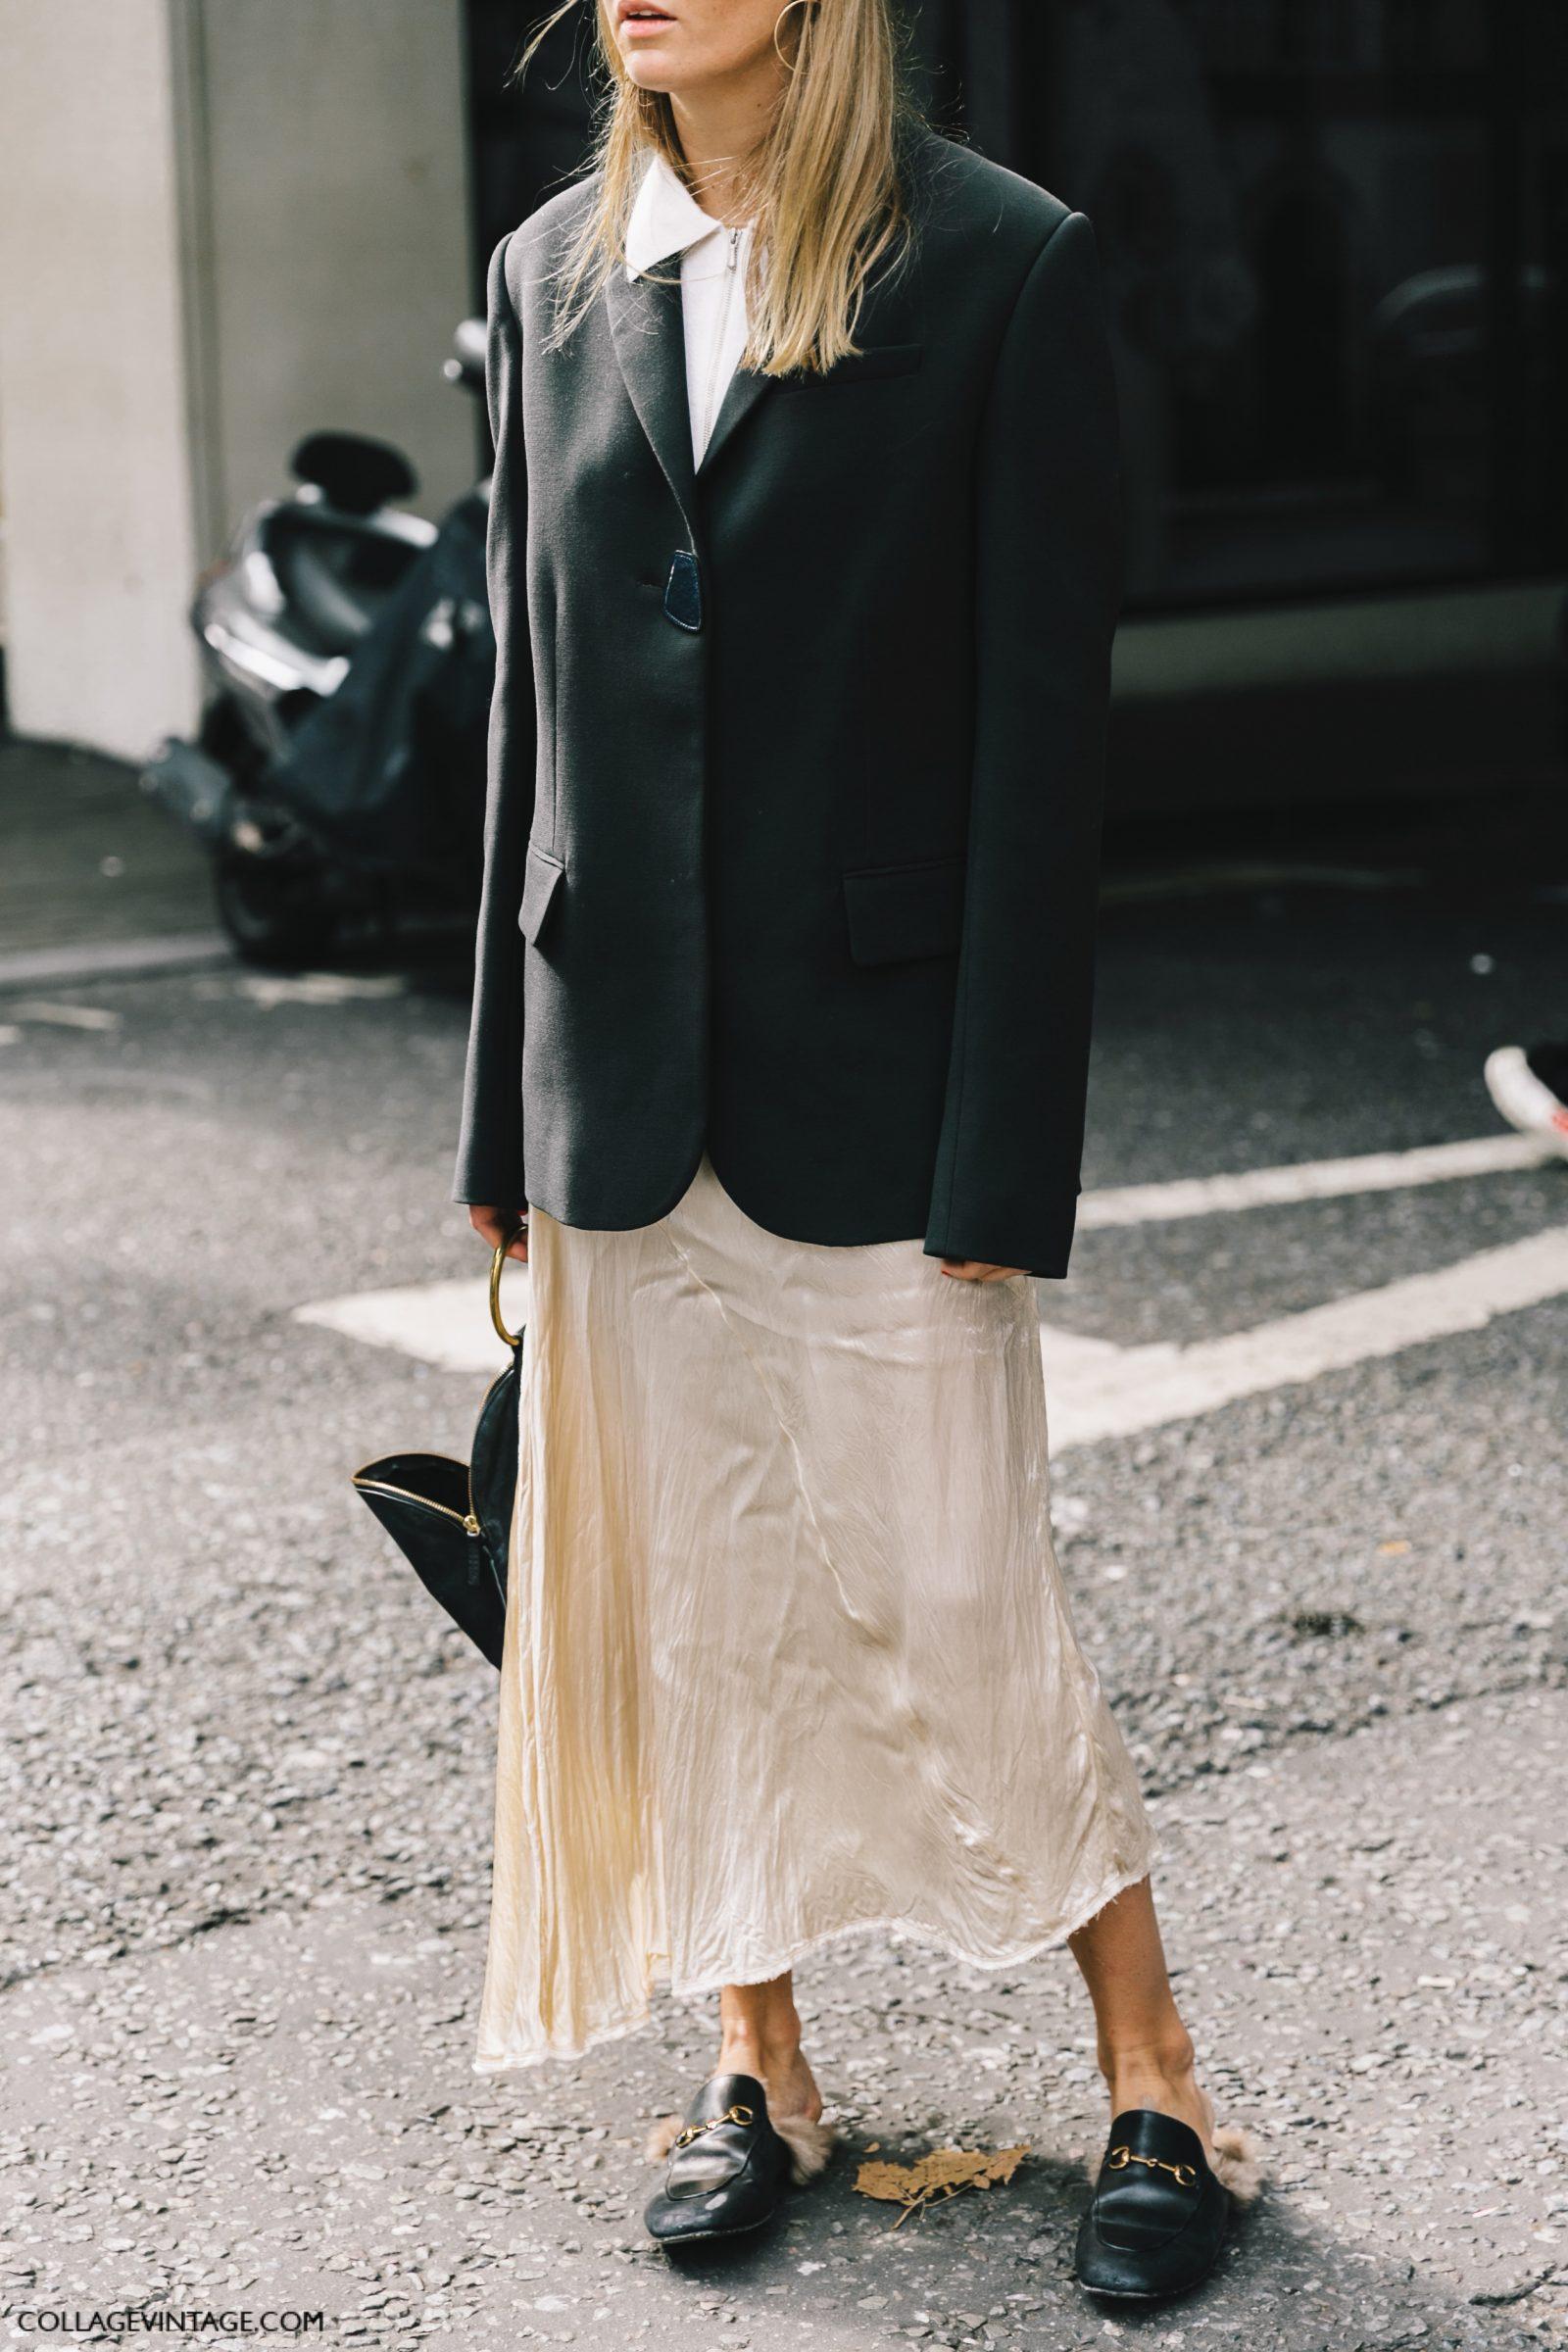 lfw-london_fashion_week_ss17-street_style-outfits-collage_vintage-vintage-roksanda-christopher_kane-joseph-66